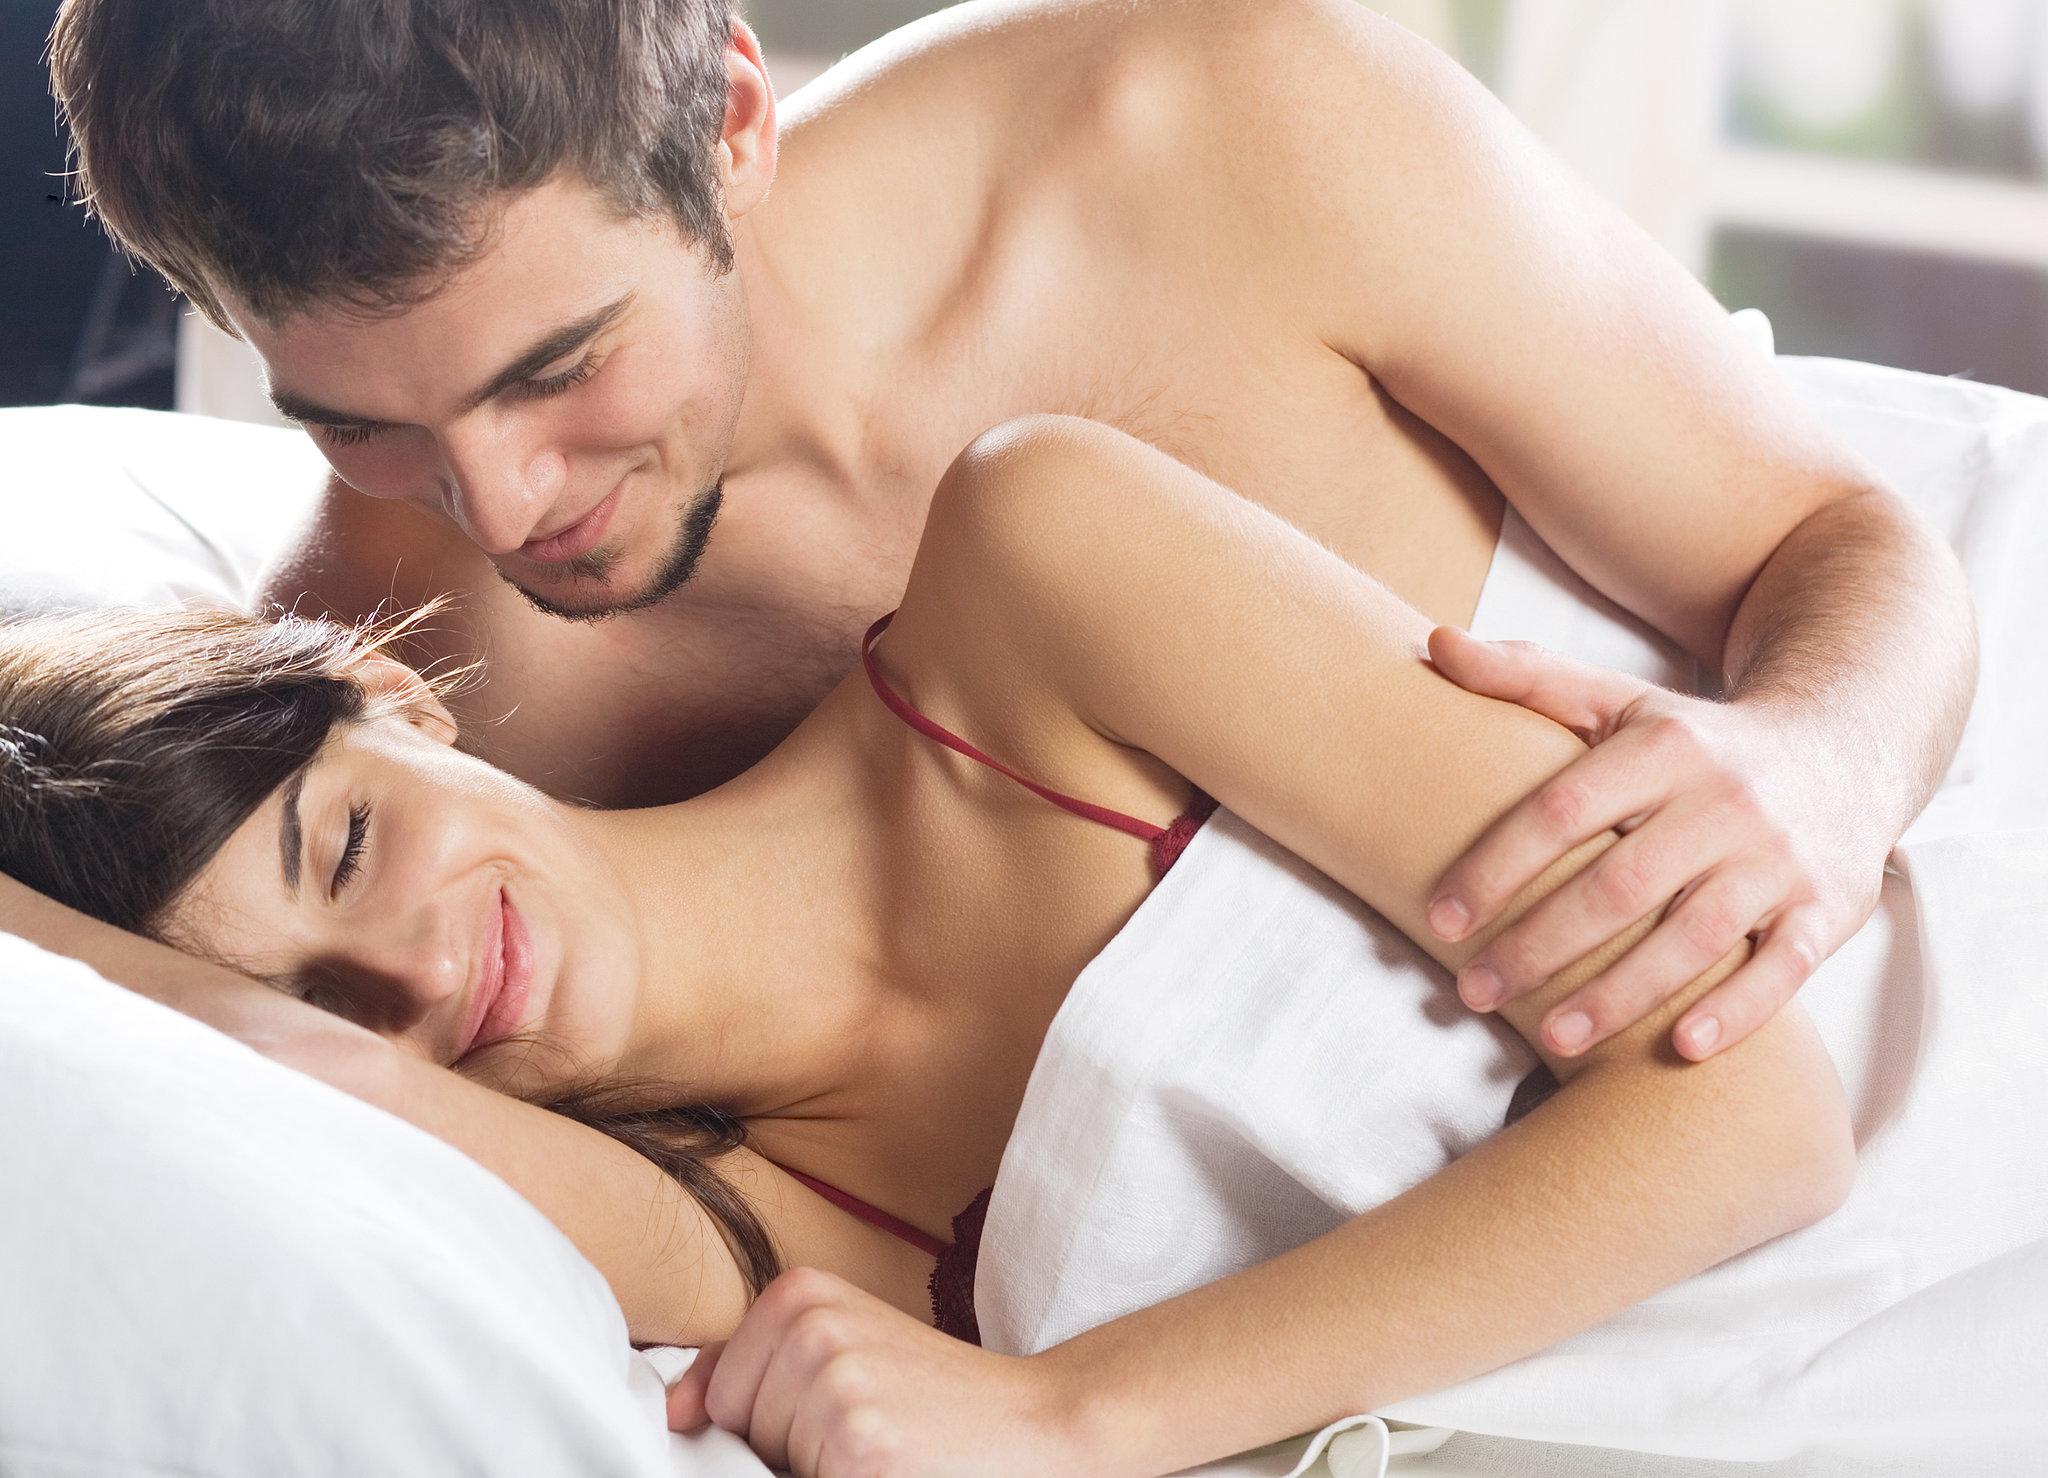 Советы девушкам о сексе 21 фотография